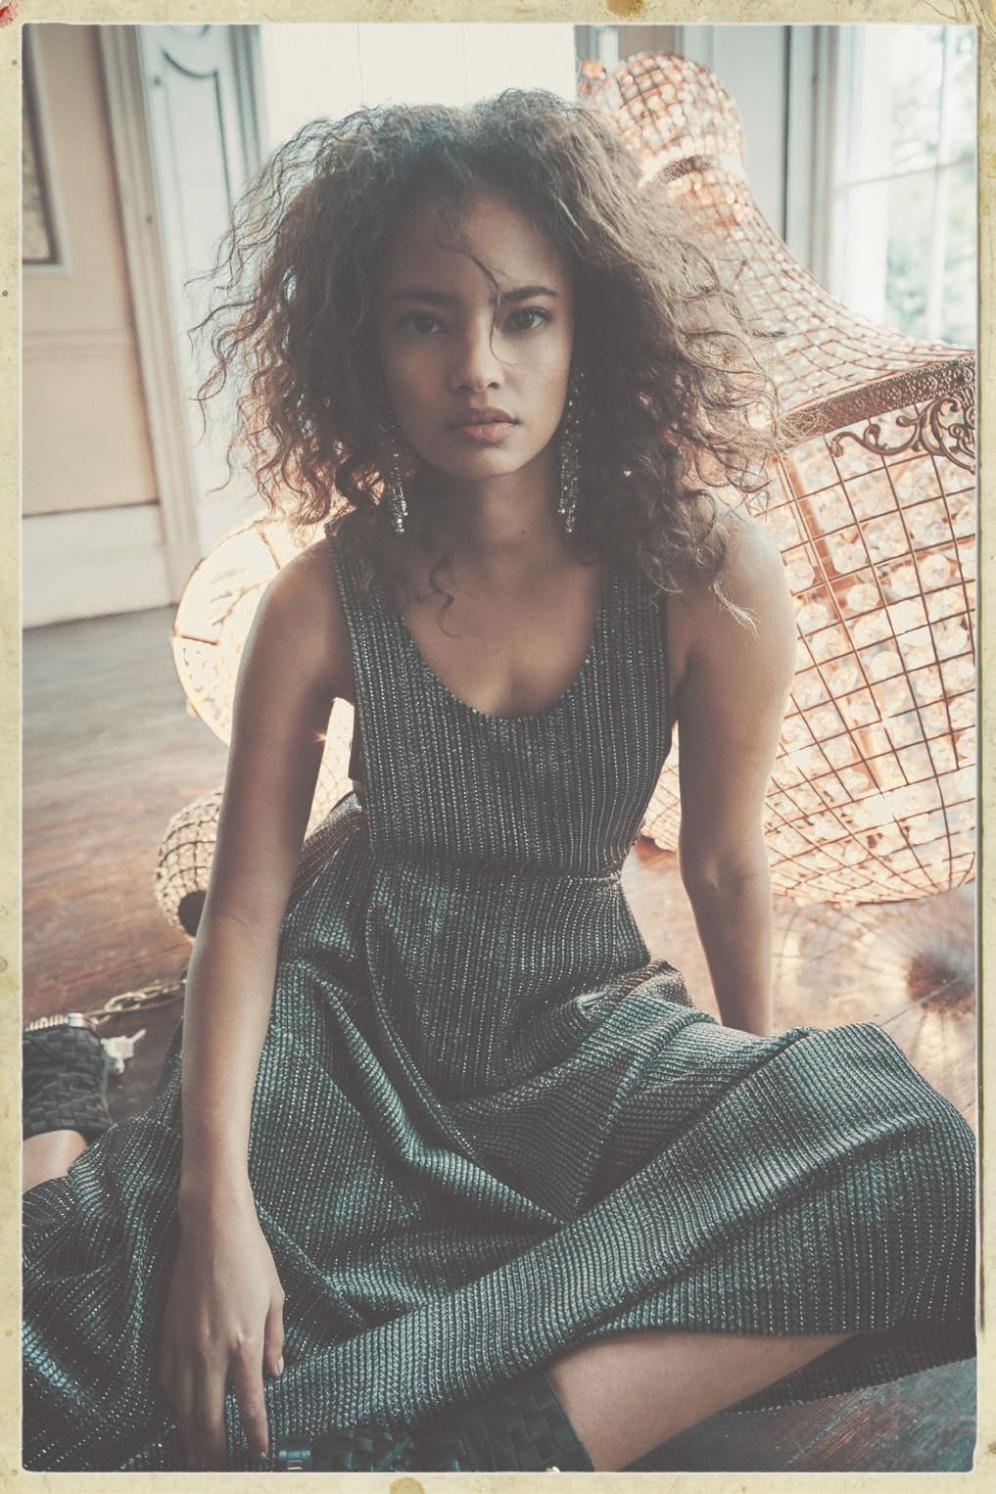 Harpers Bazaar | A gleam in her eyes